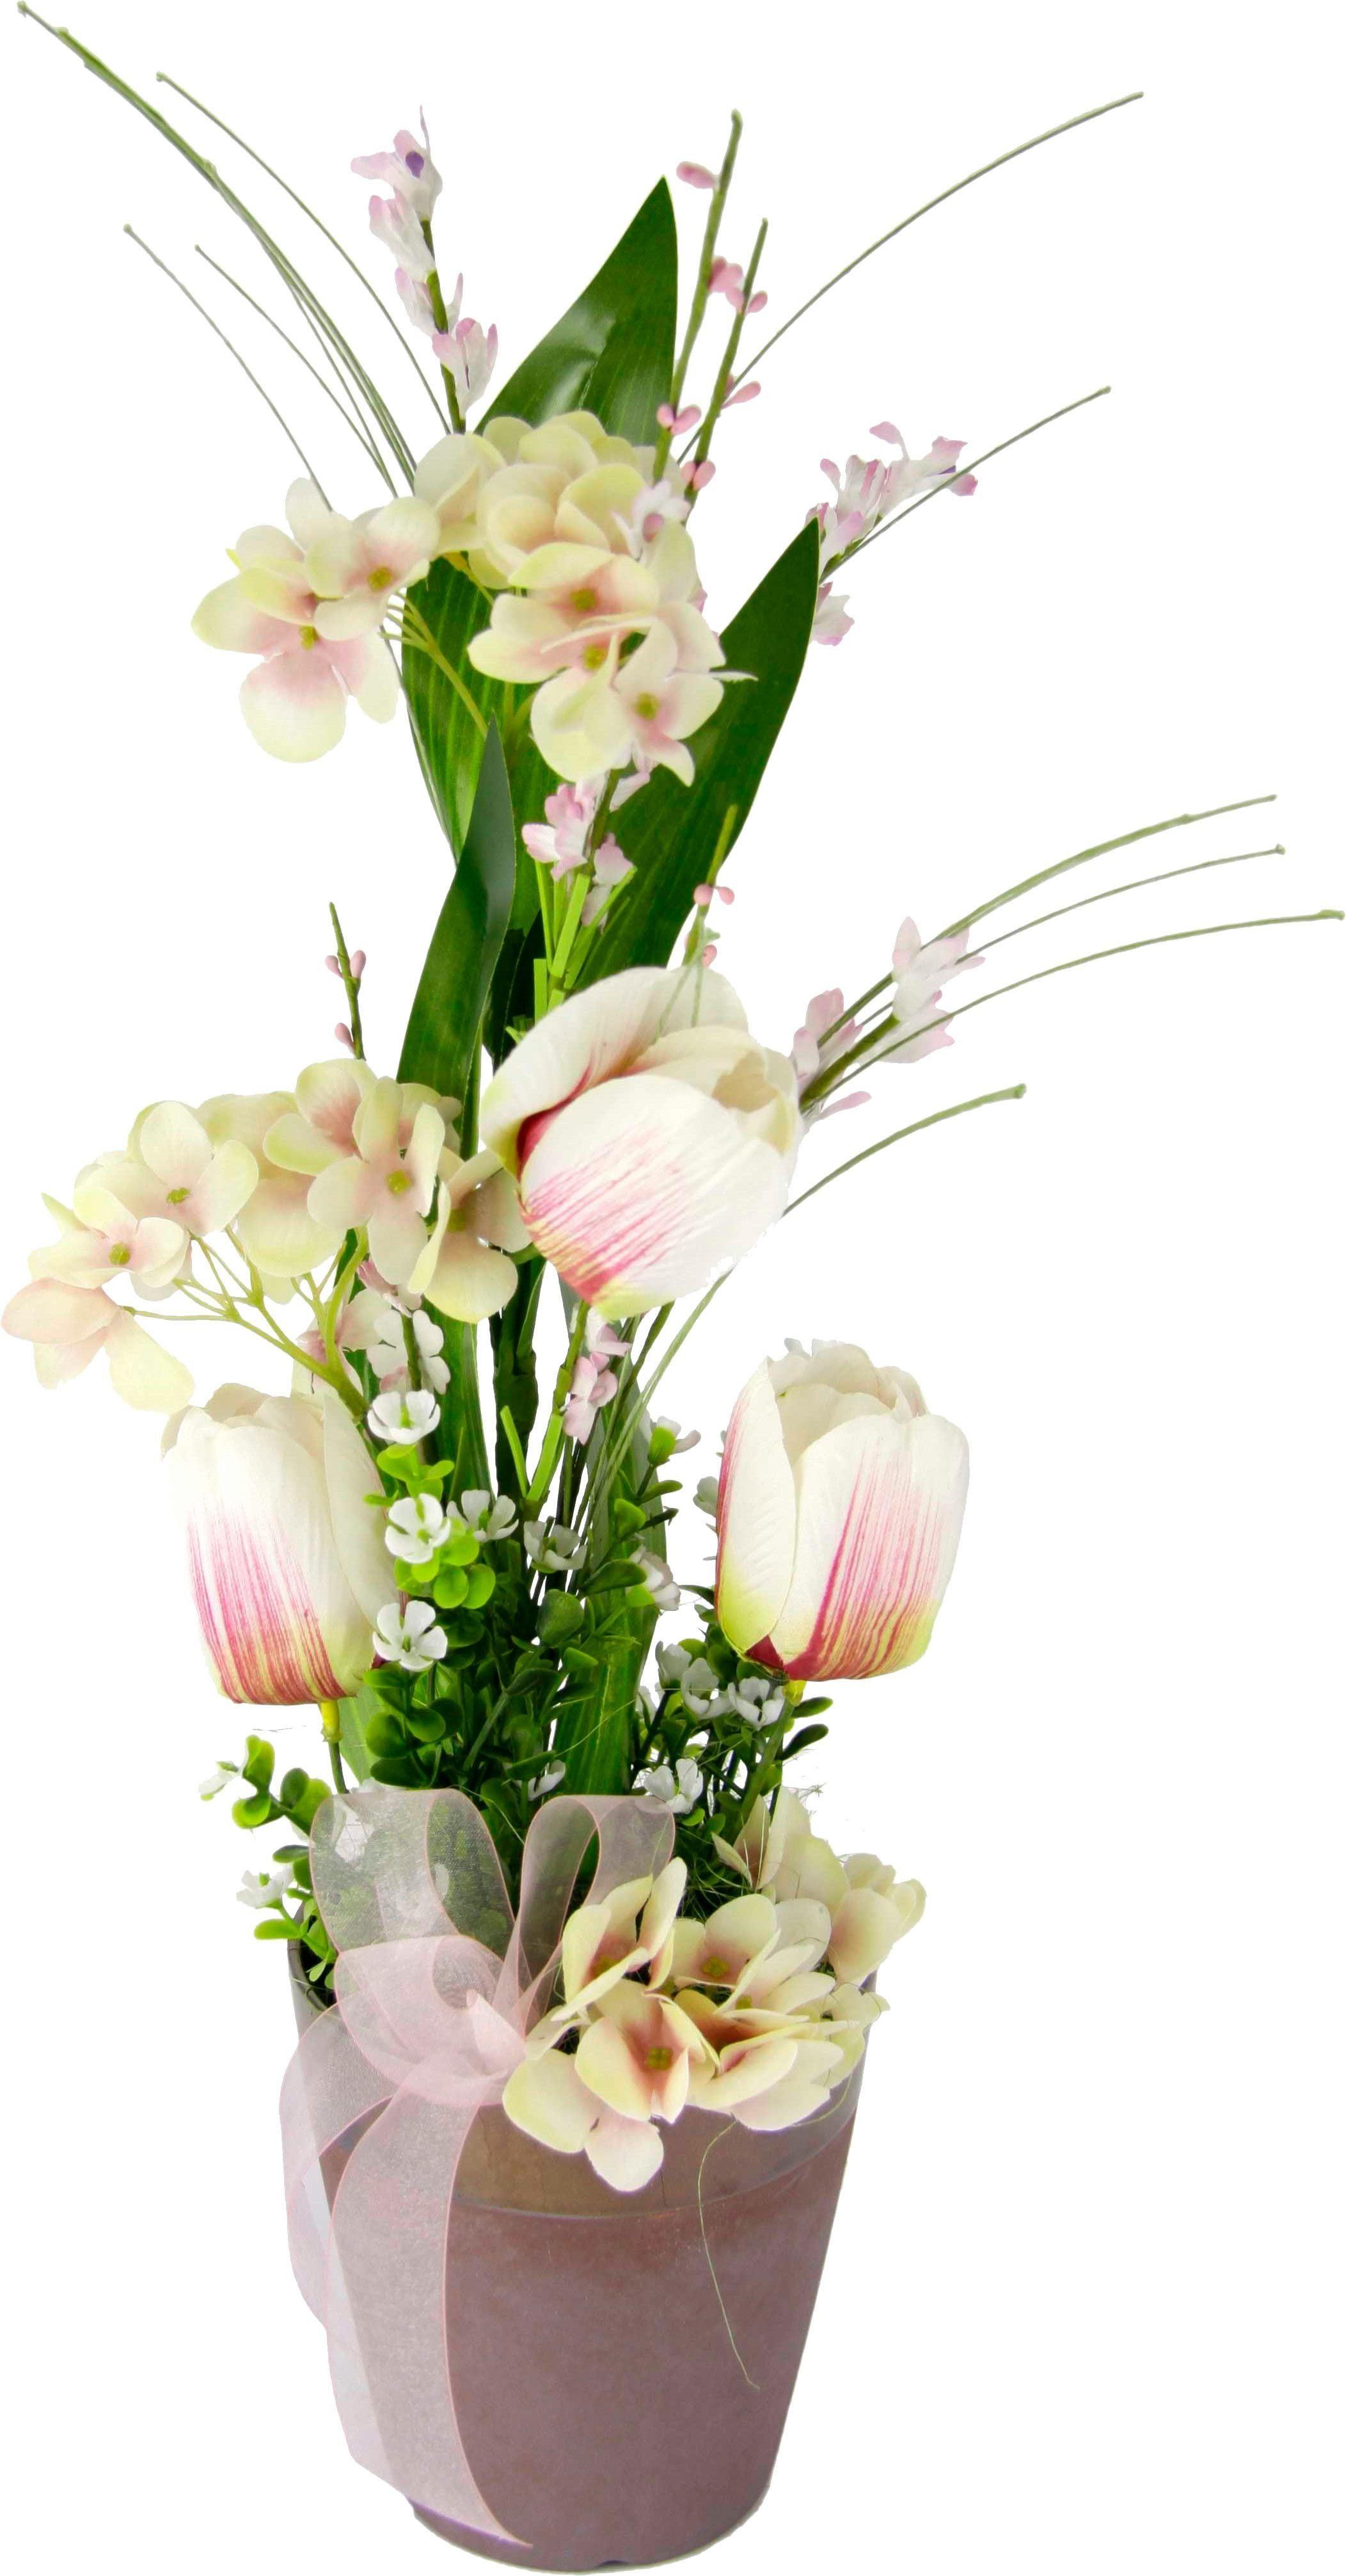 Kunstblume Tulpen im Topf, Höhe 46 cm,